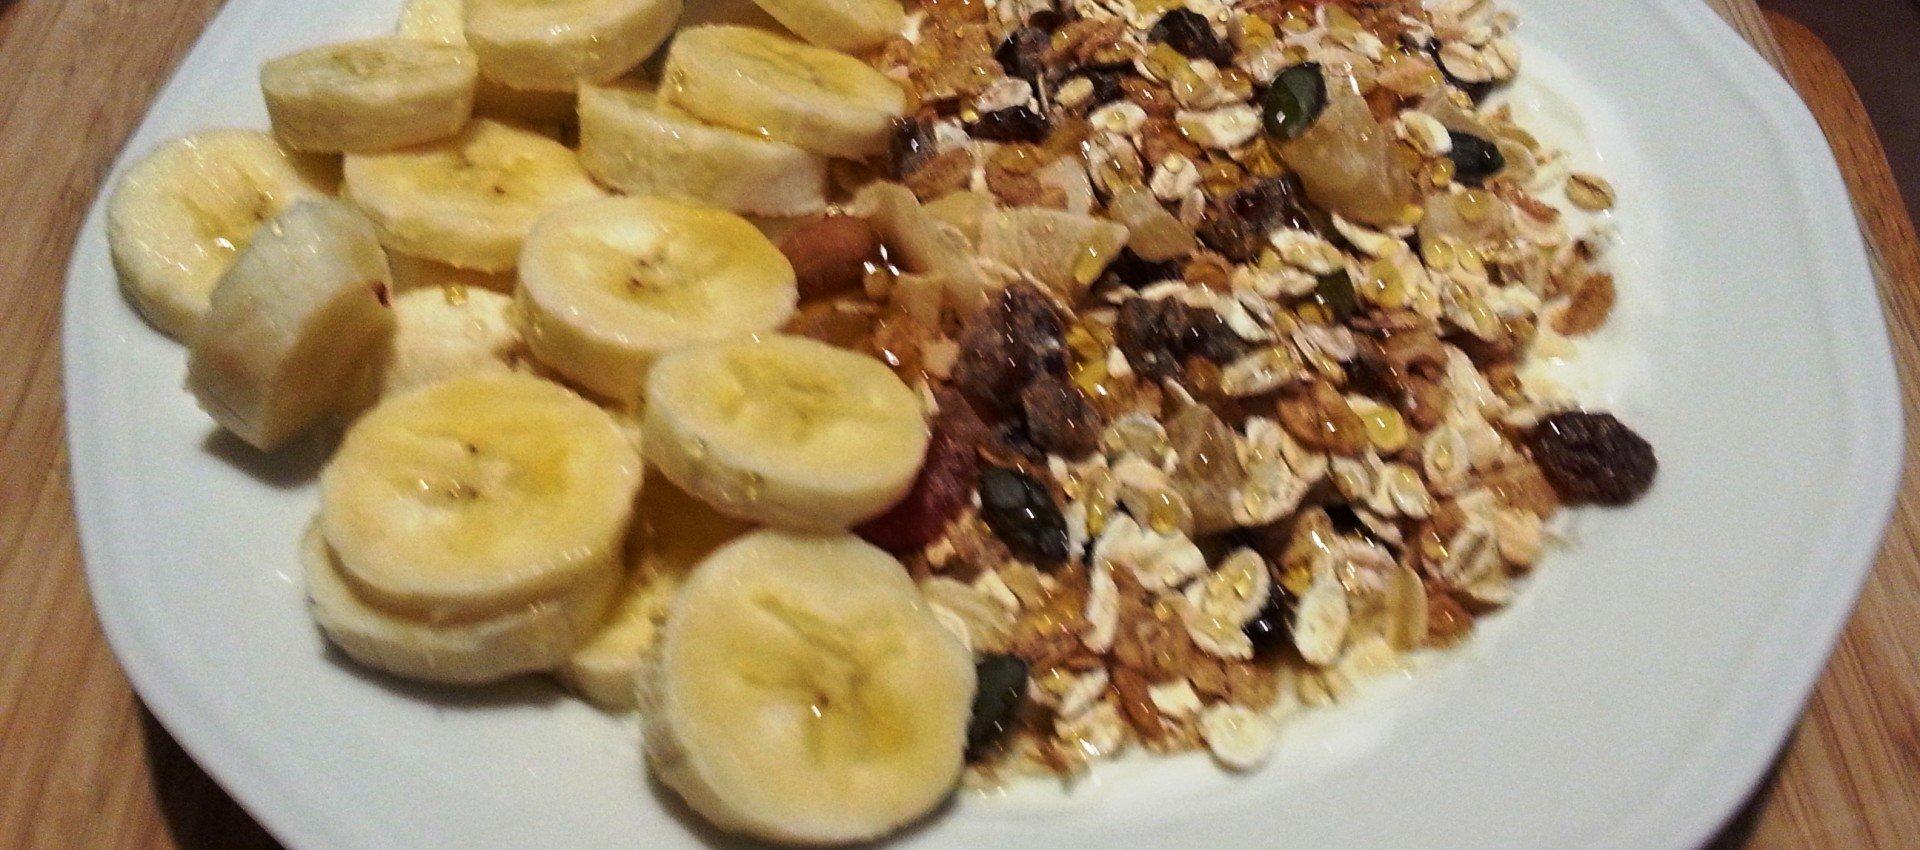 Bananen Müsli mit Skyr